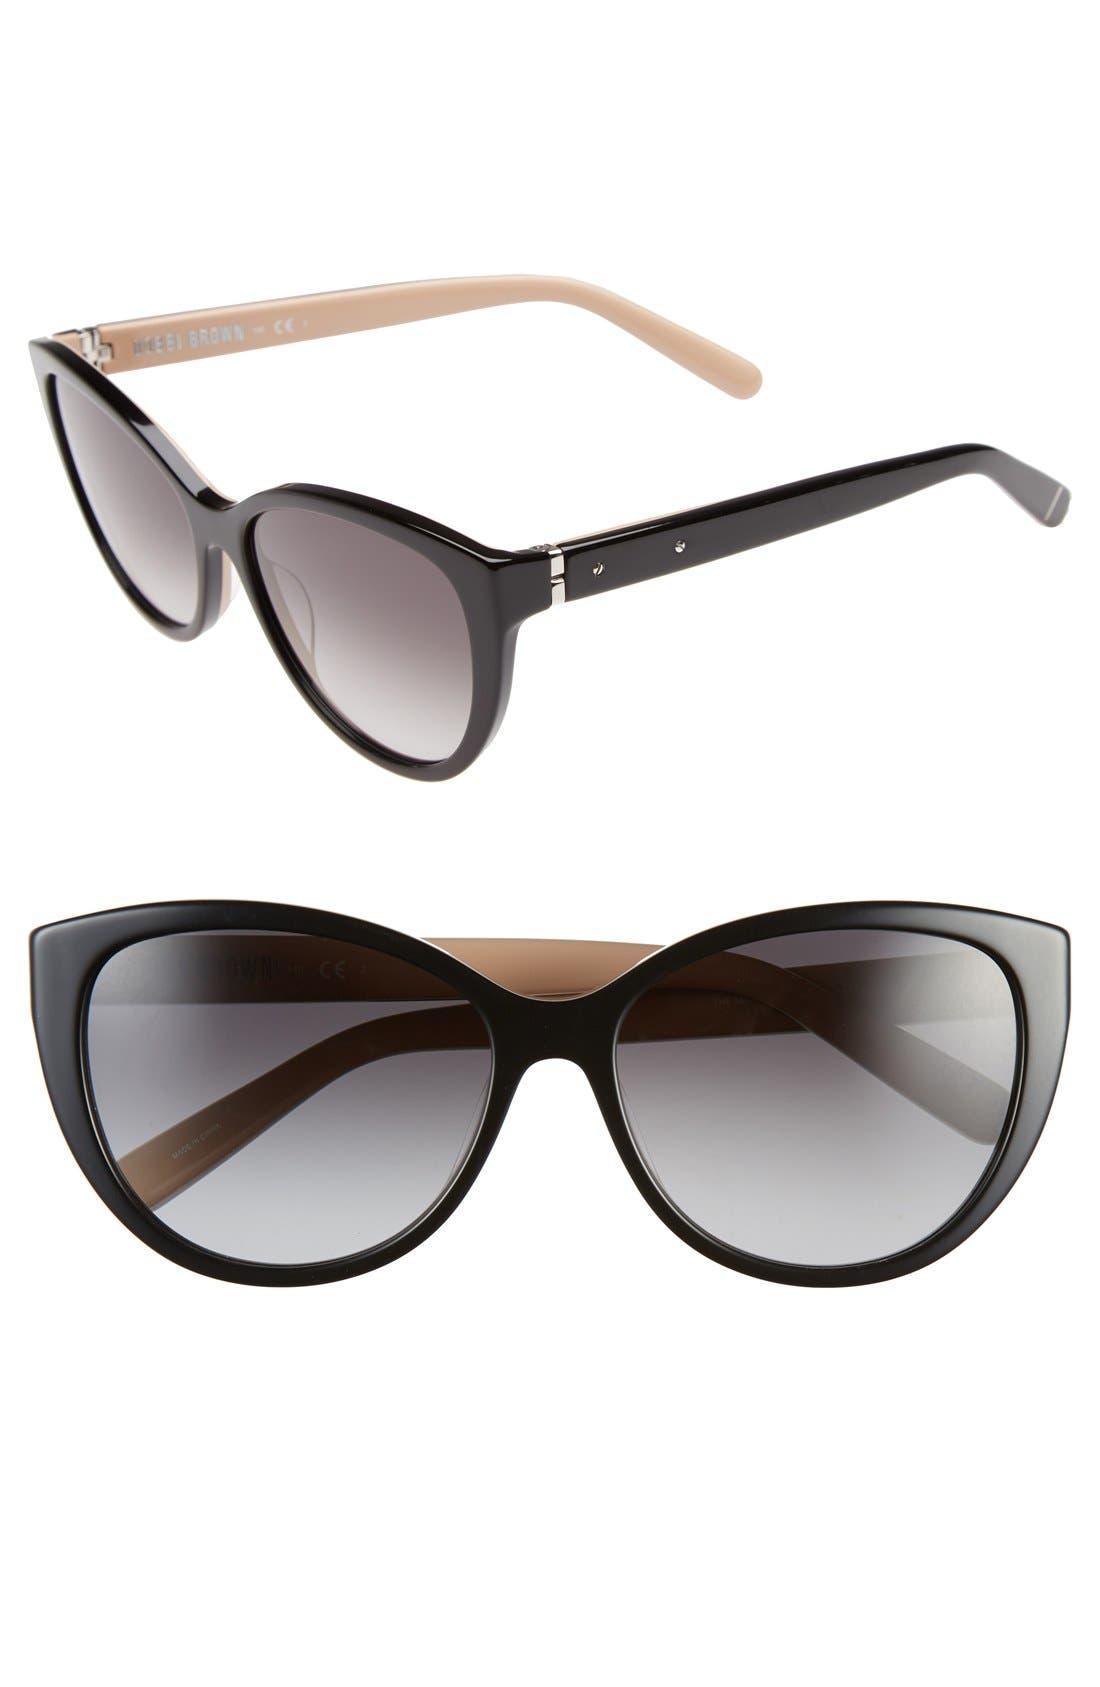 Main Image - Bobbi Brown 'The Marylins' 56mm Cat Eye Sunglasses